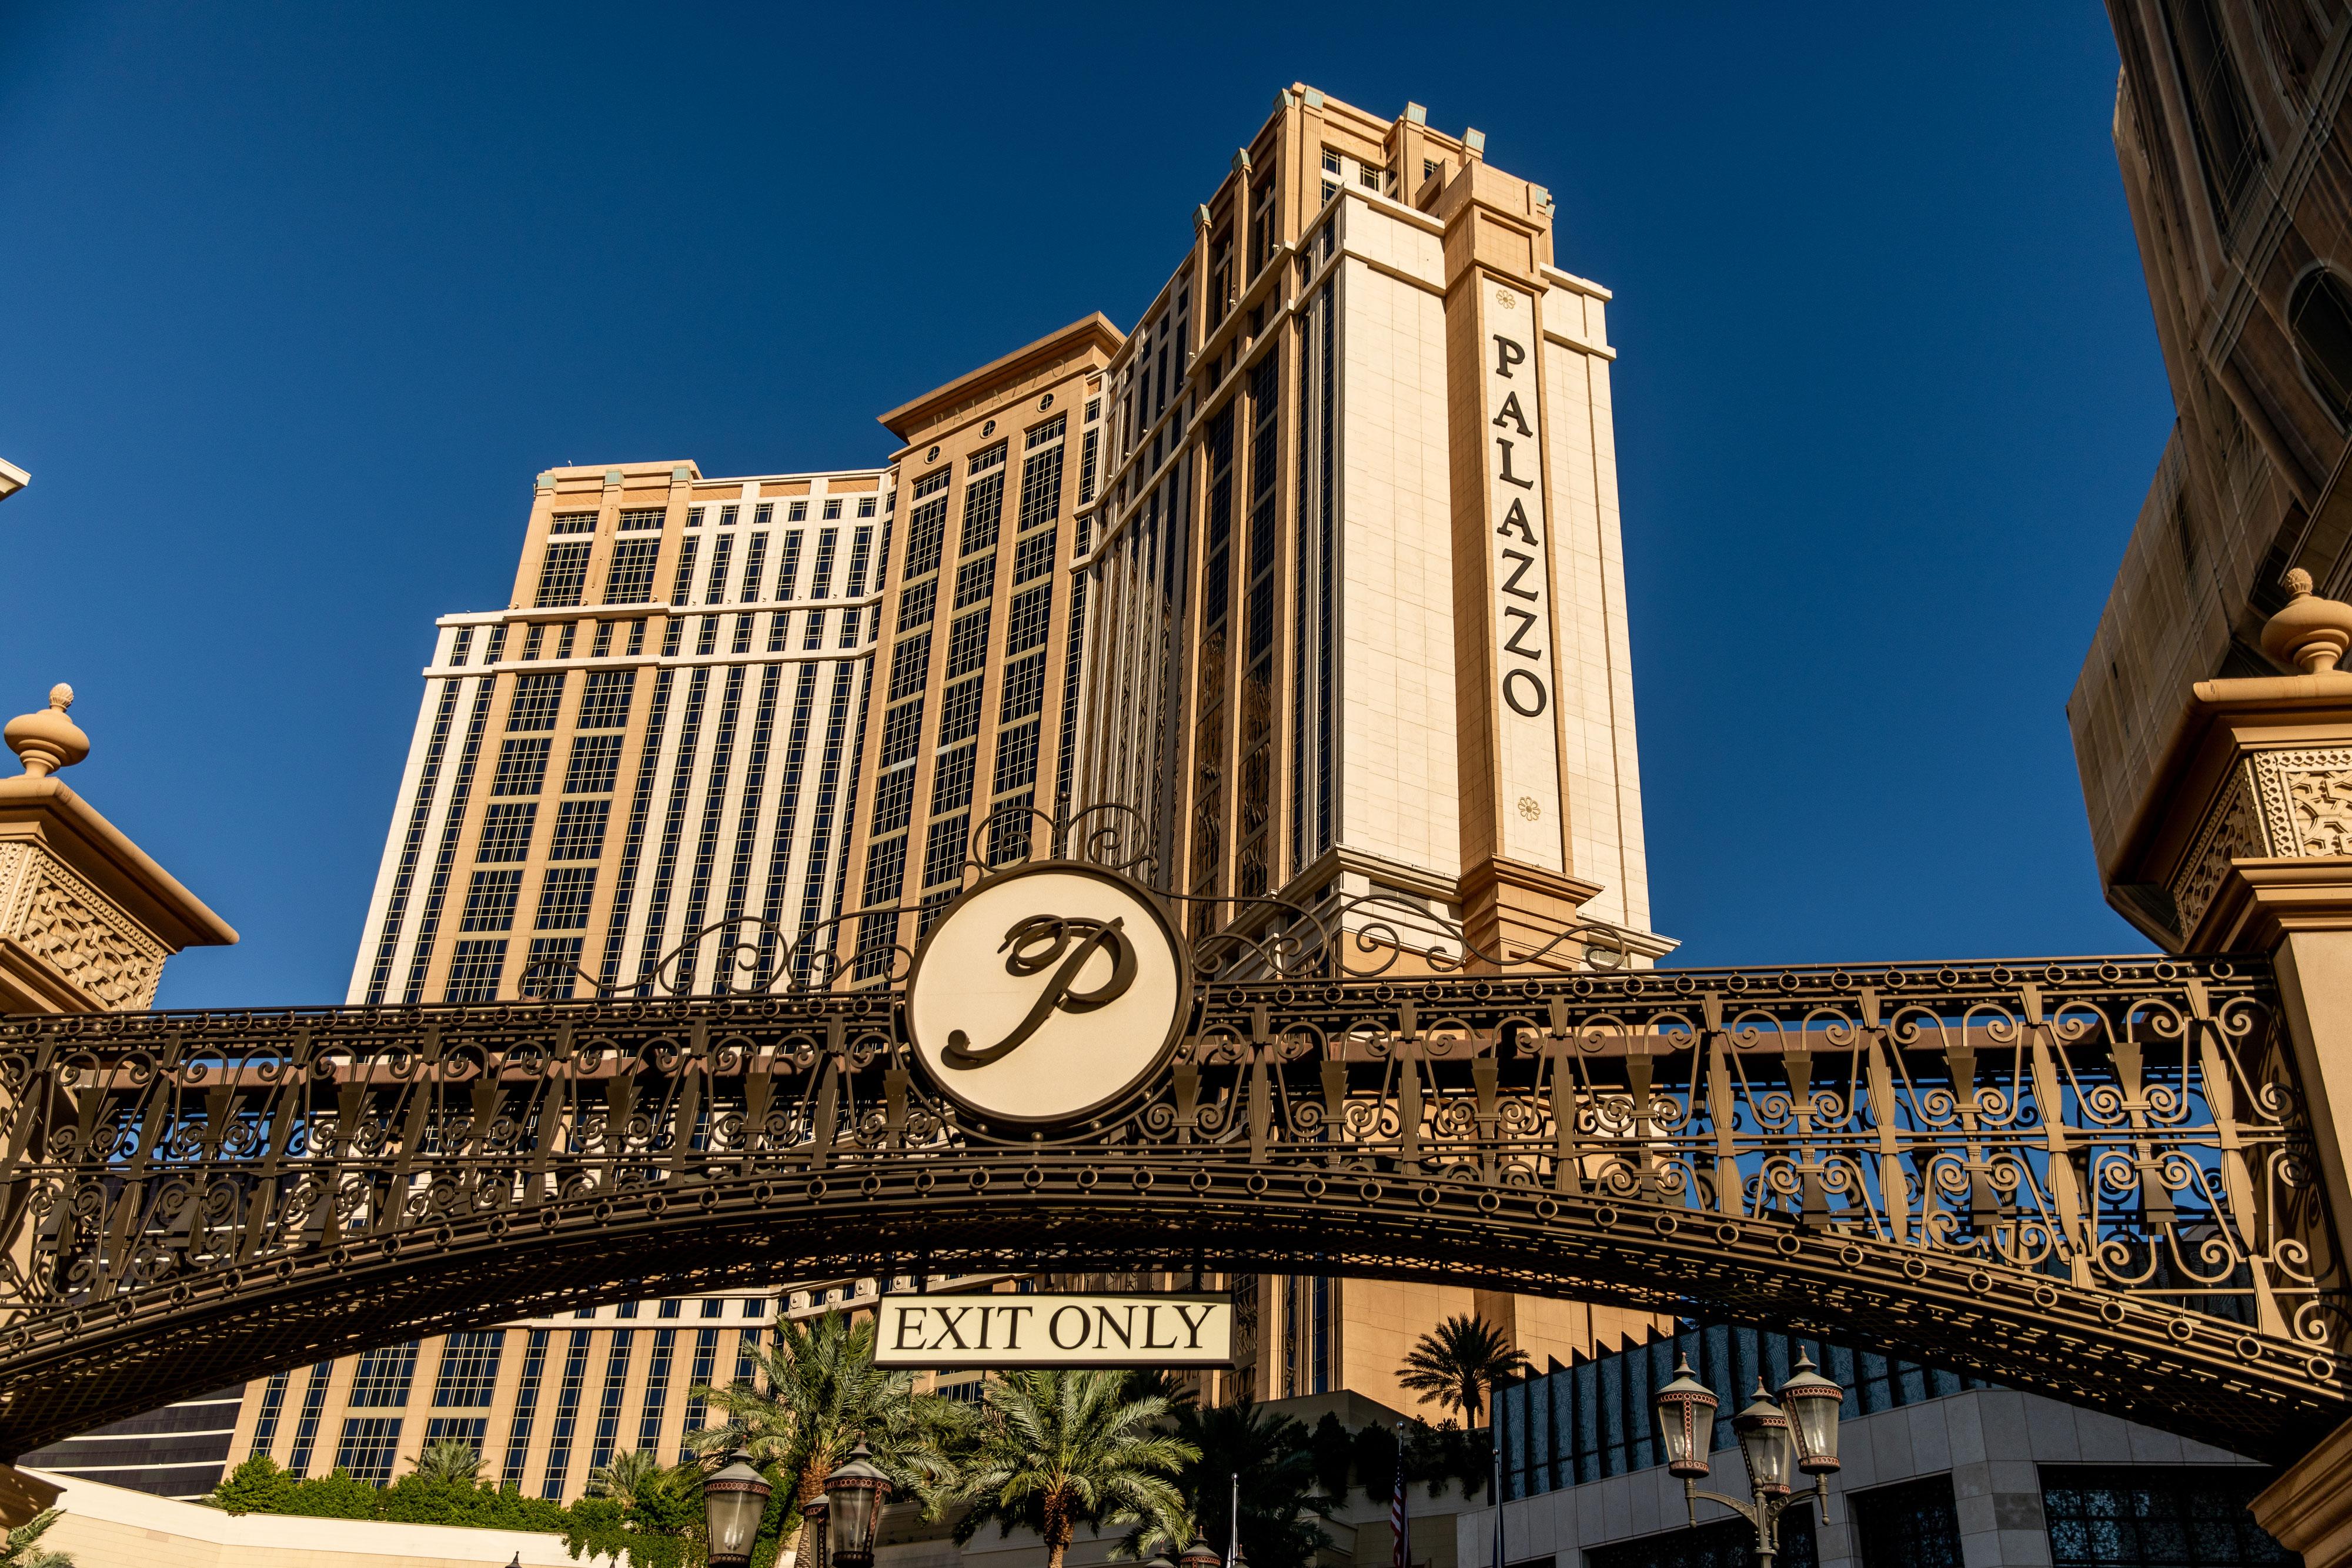 GOP mega-donor Sheldon Adelson considers selling his Las Vegas Sands casinos